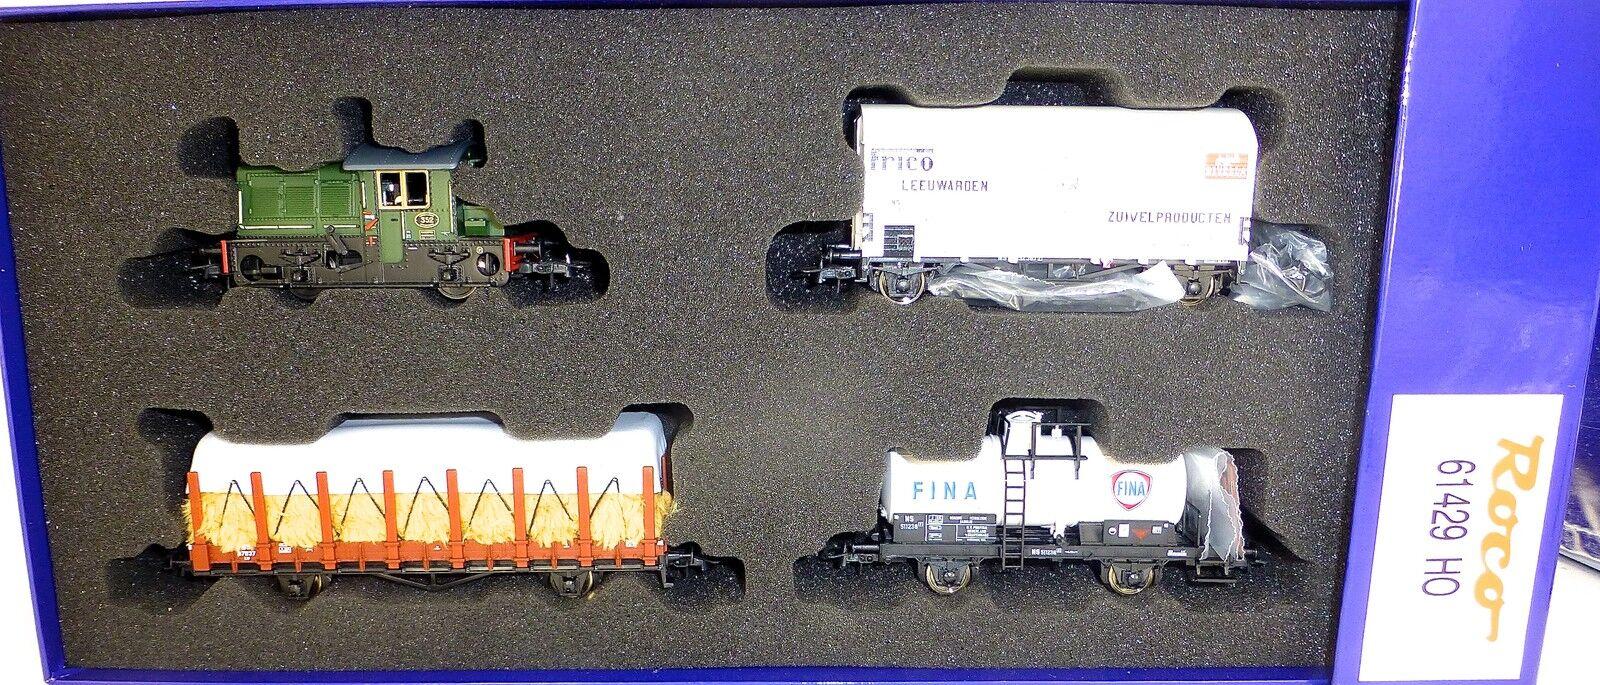 Ns serie 200 300 tren de Cochega set epiii DSS nem roco 61429 h0 1 87 OVP kb3 µg